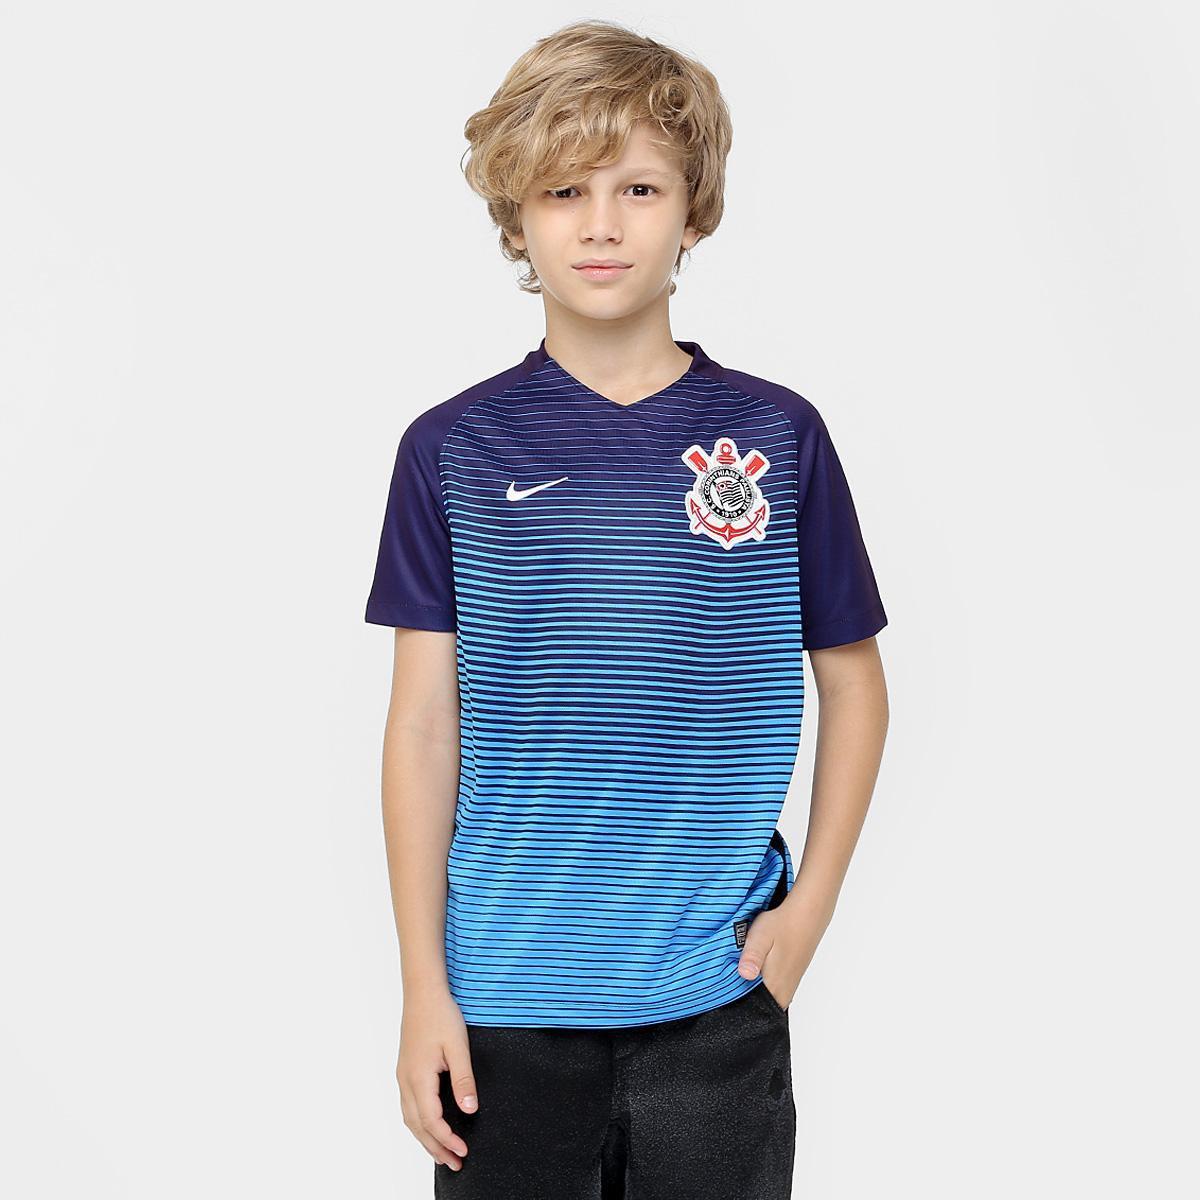 Camisa Corinthians Juvenil III 2016 s nº Torcedor Nike  123dd80879b7a